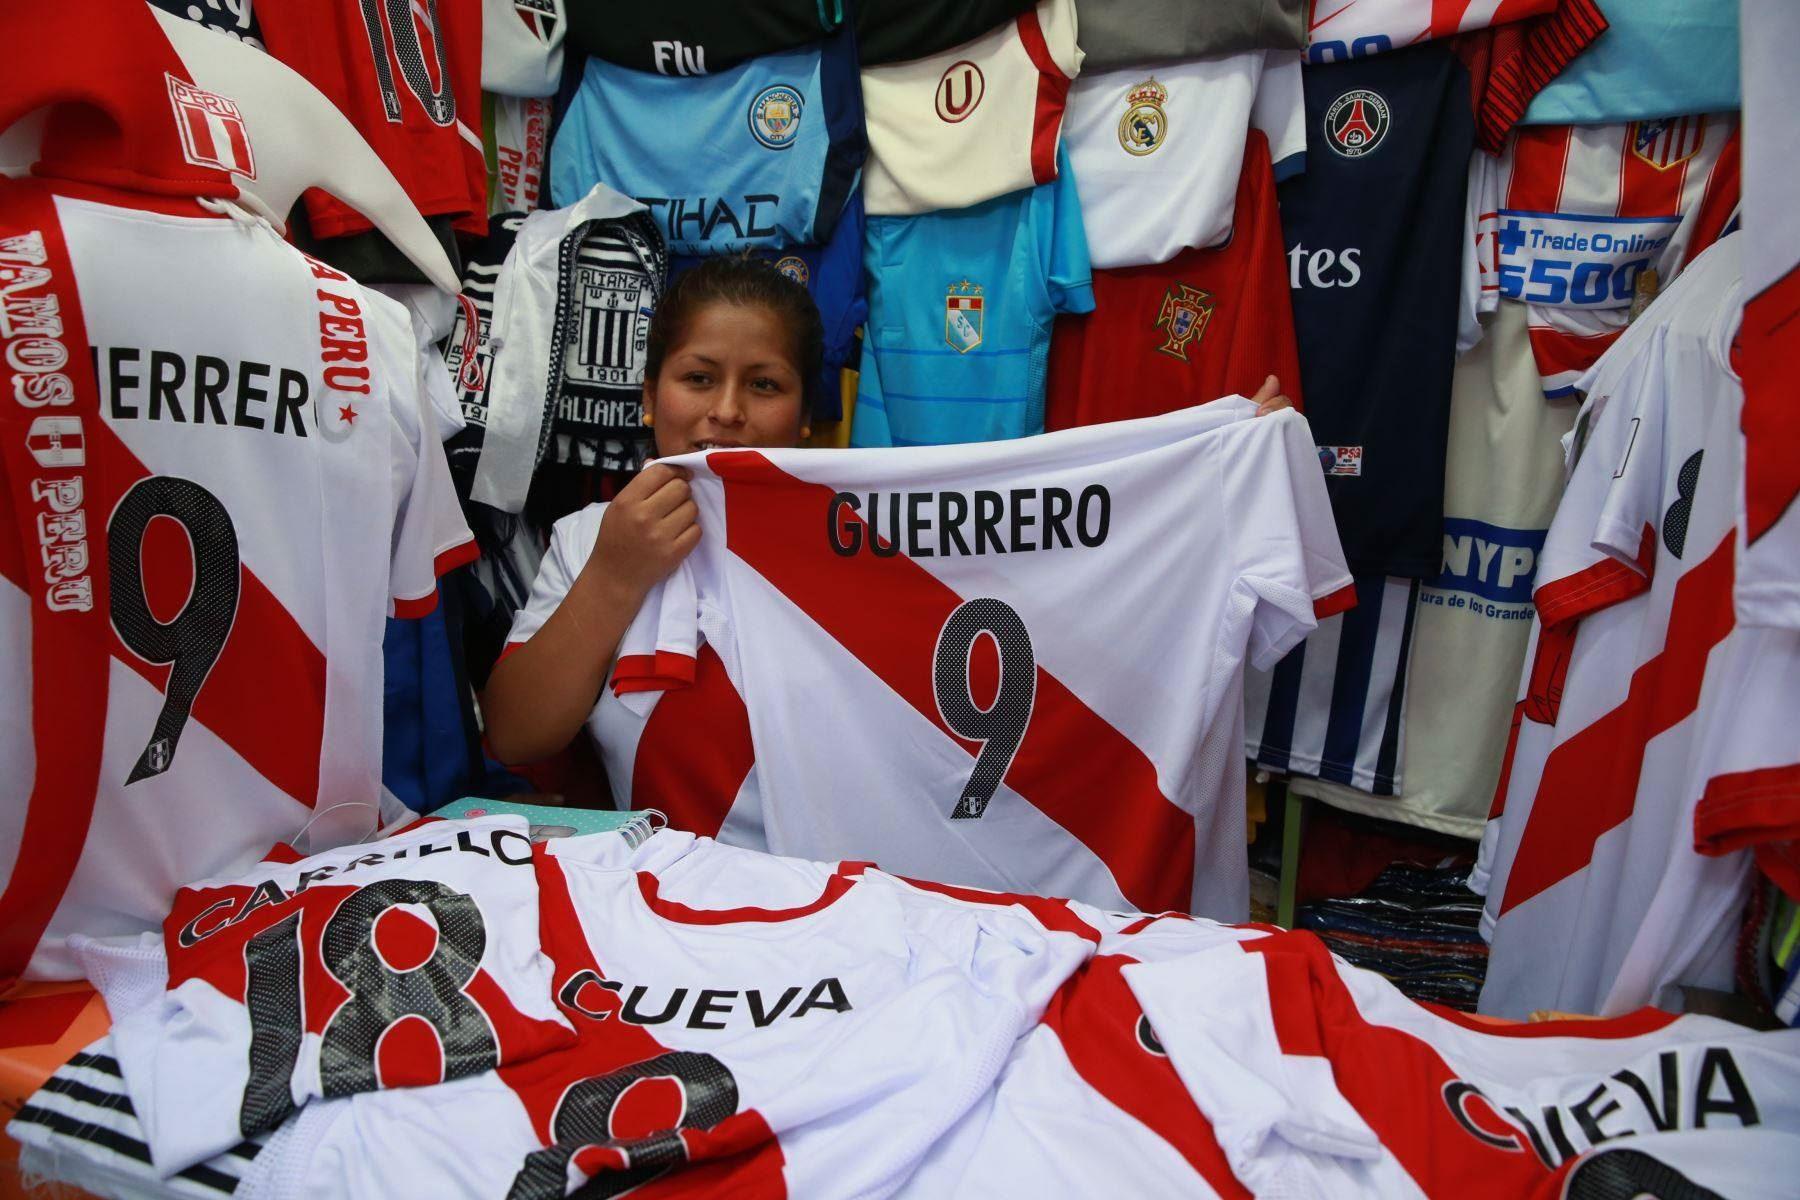 Mundial Rusia 2018 impulsa ingresos de las pyme textiles de Cusco.Foto:  ANDINA/Percy Hurtado